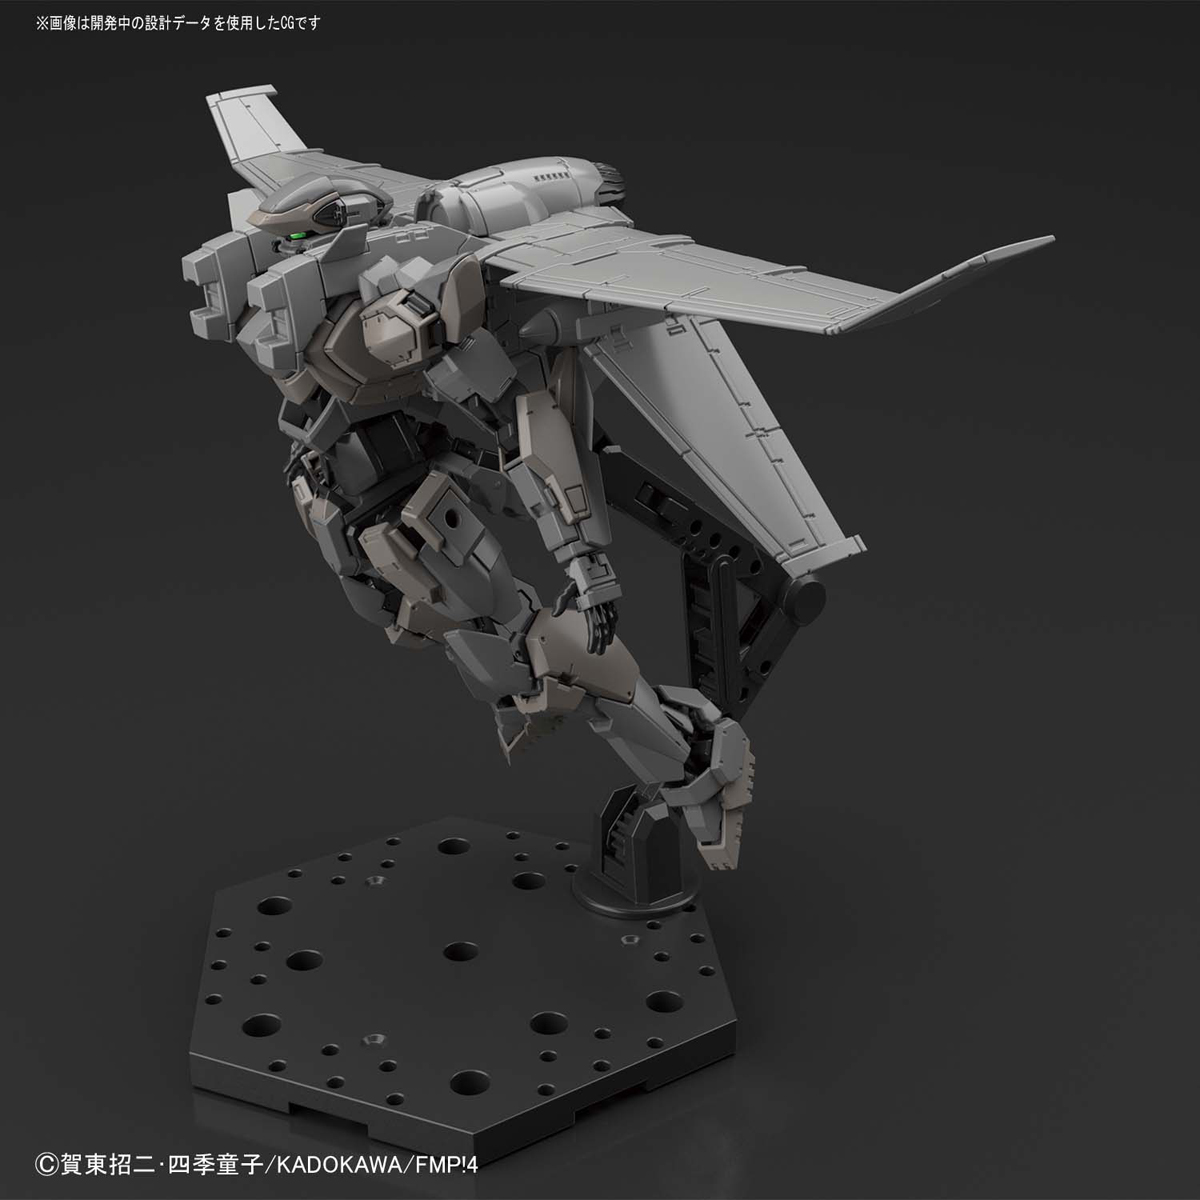 HG 『フルメタル・パニック! Invisible Victory』 1/60 アーバレストVer.IV(緊急展開ブースター装備仕様) プラモデル